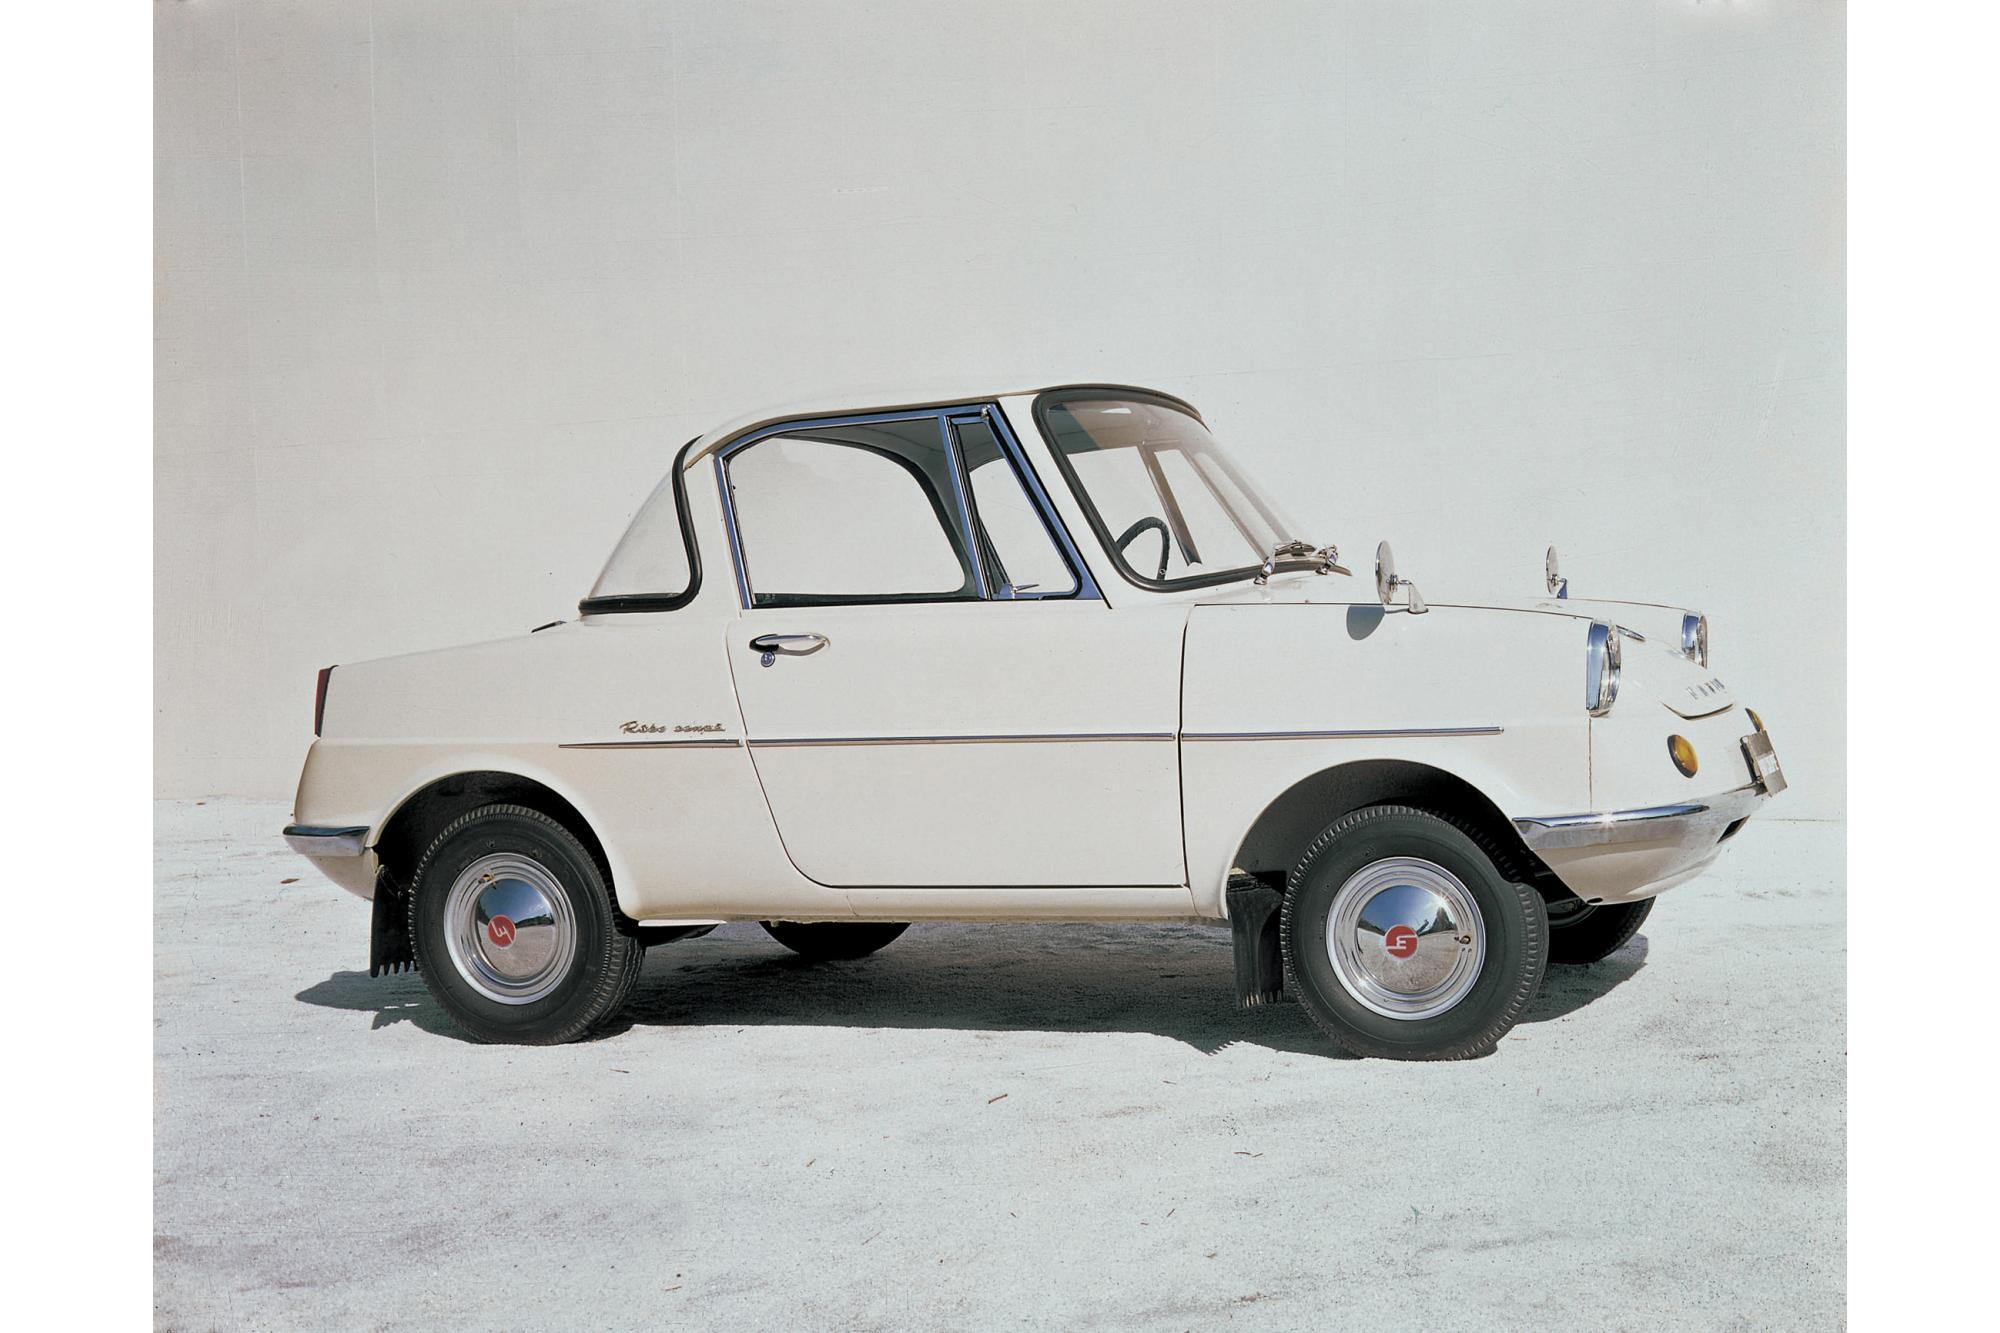 R360 Coupe: Το πρώτο αυτοκίνητο της Mazda.